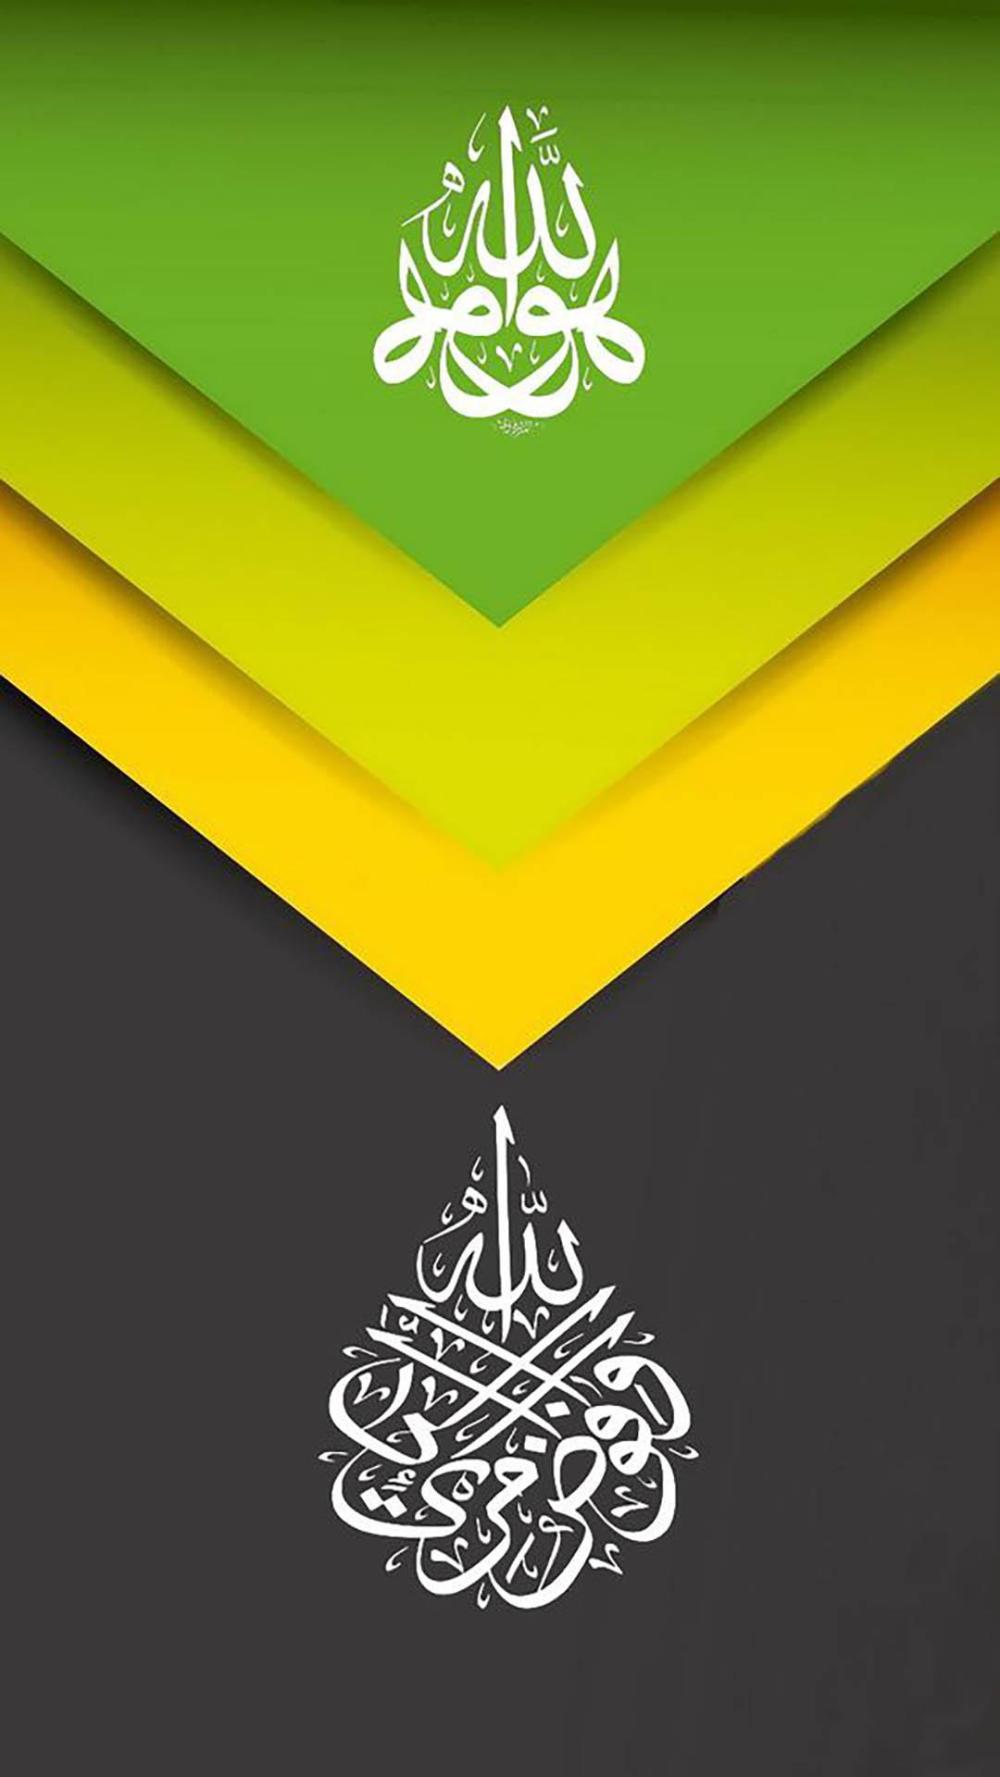 Kaligrafi Asmaul Husna Hd, 2020 Desenler